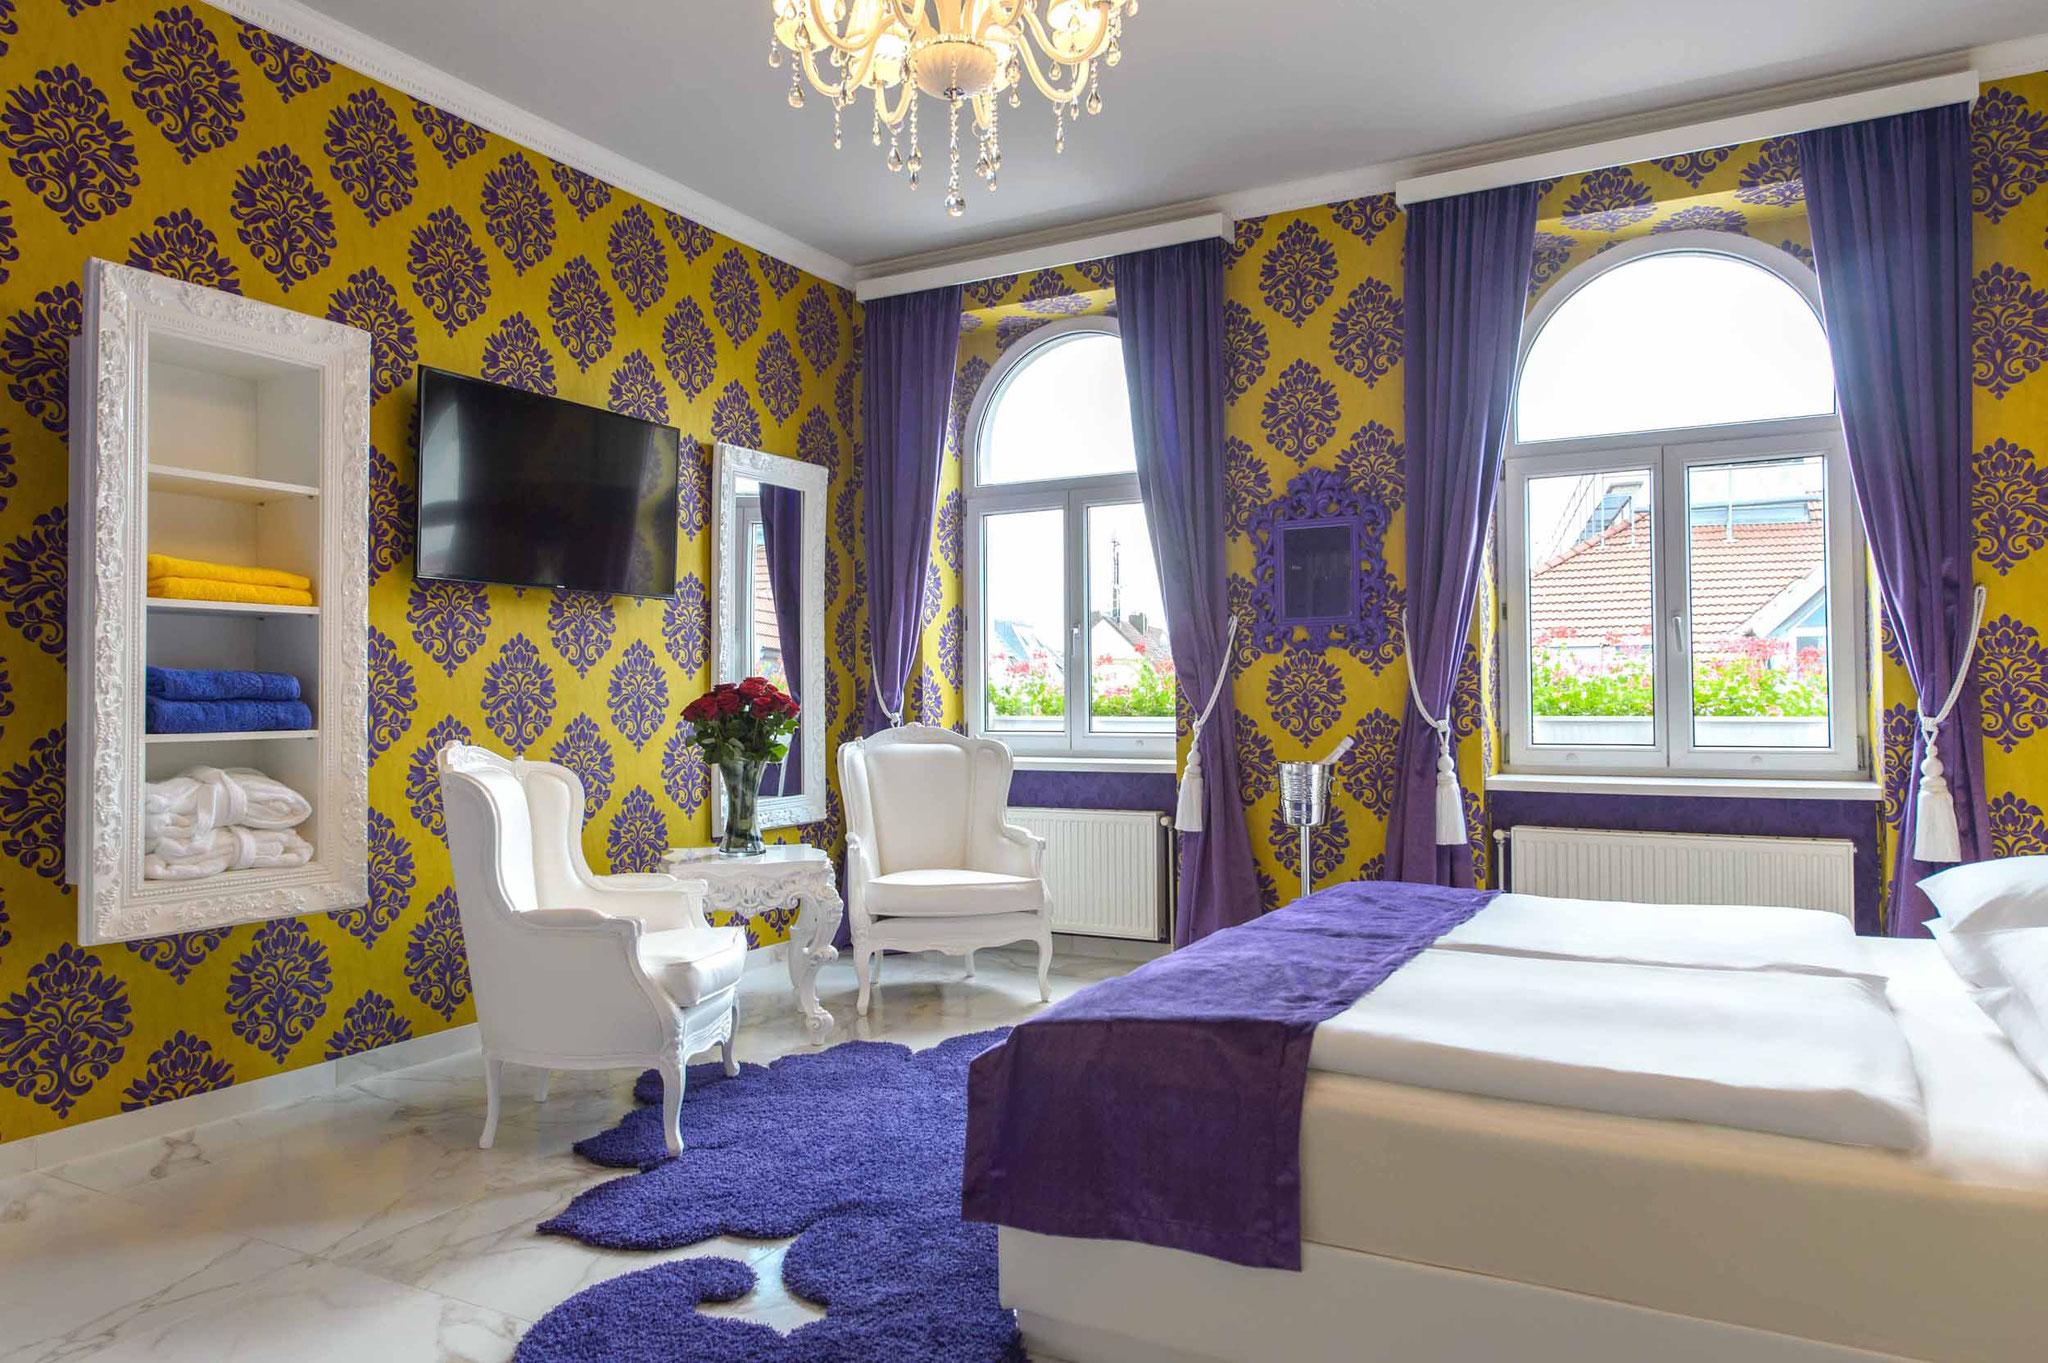 Liebeshotel Urania - Relax Suite mit Whirlpool